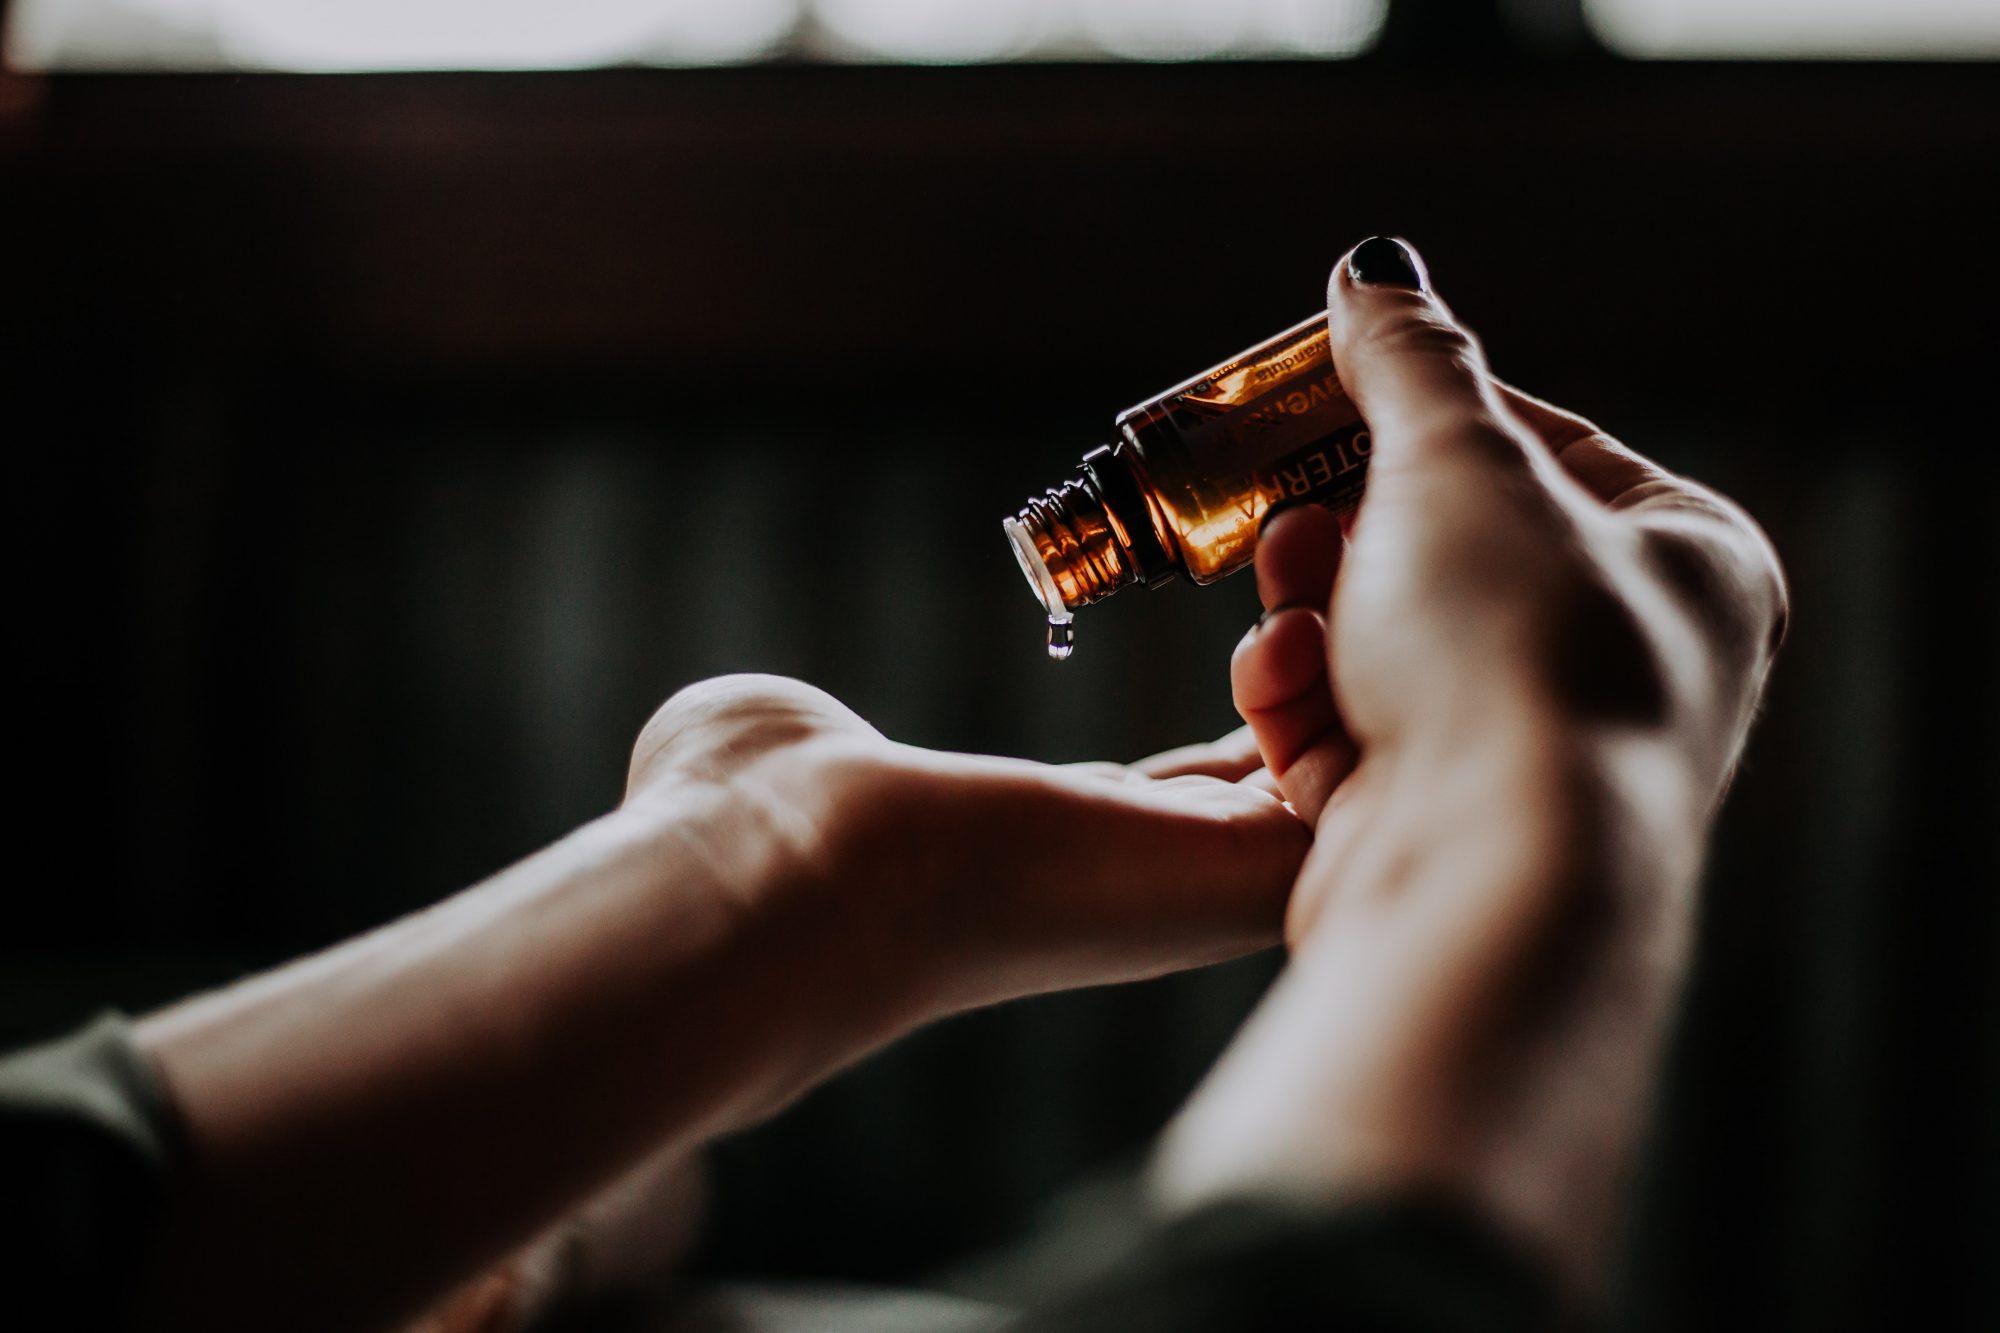 ayurveda ayurvedic beauty rituals oils